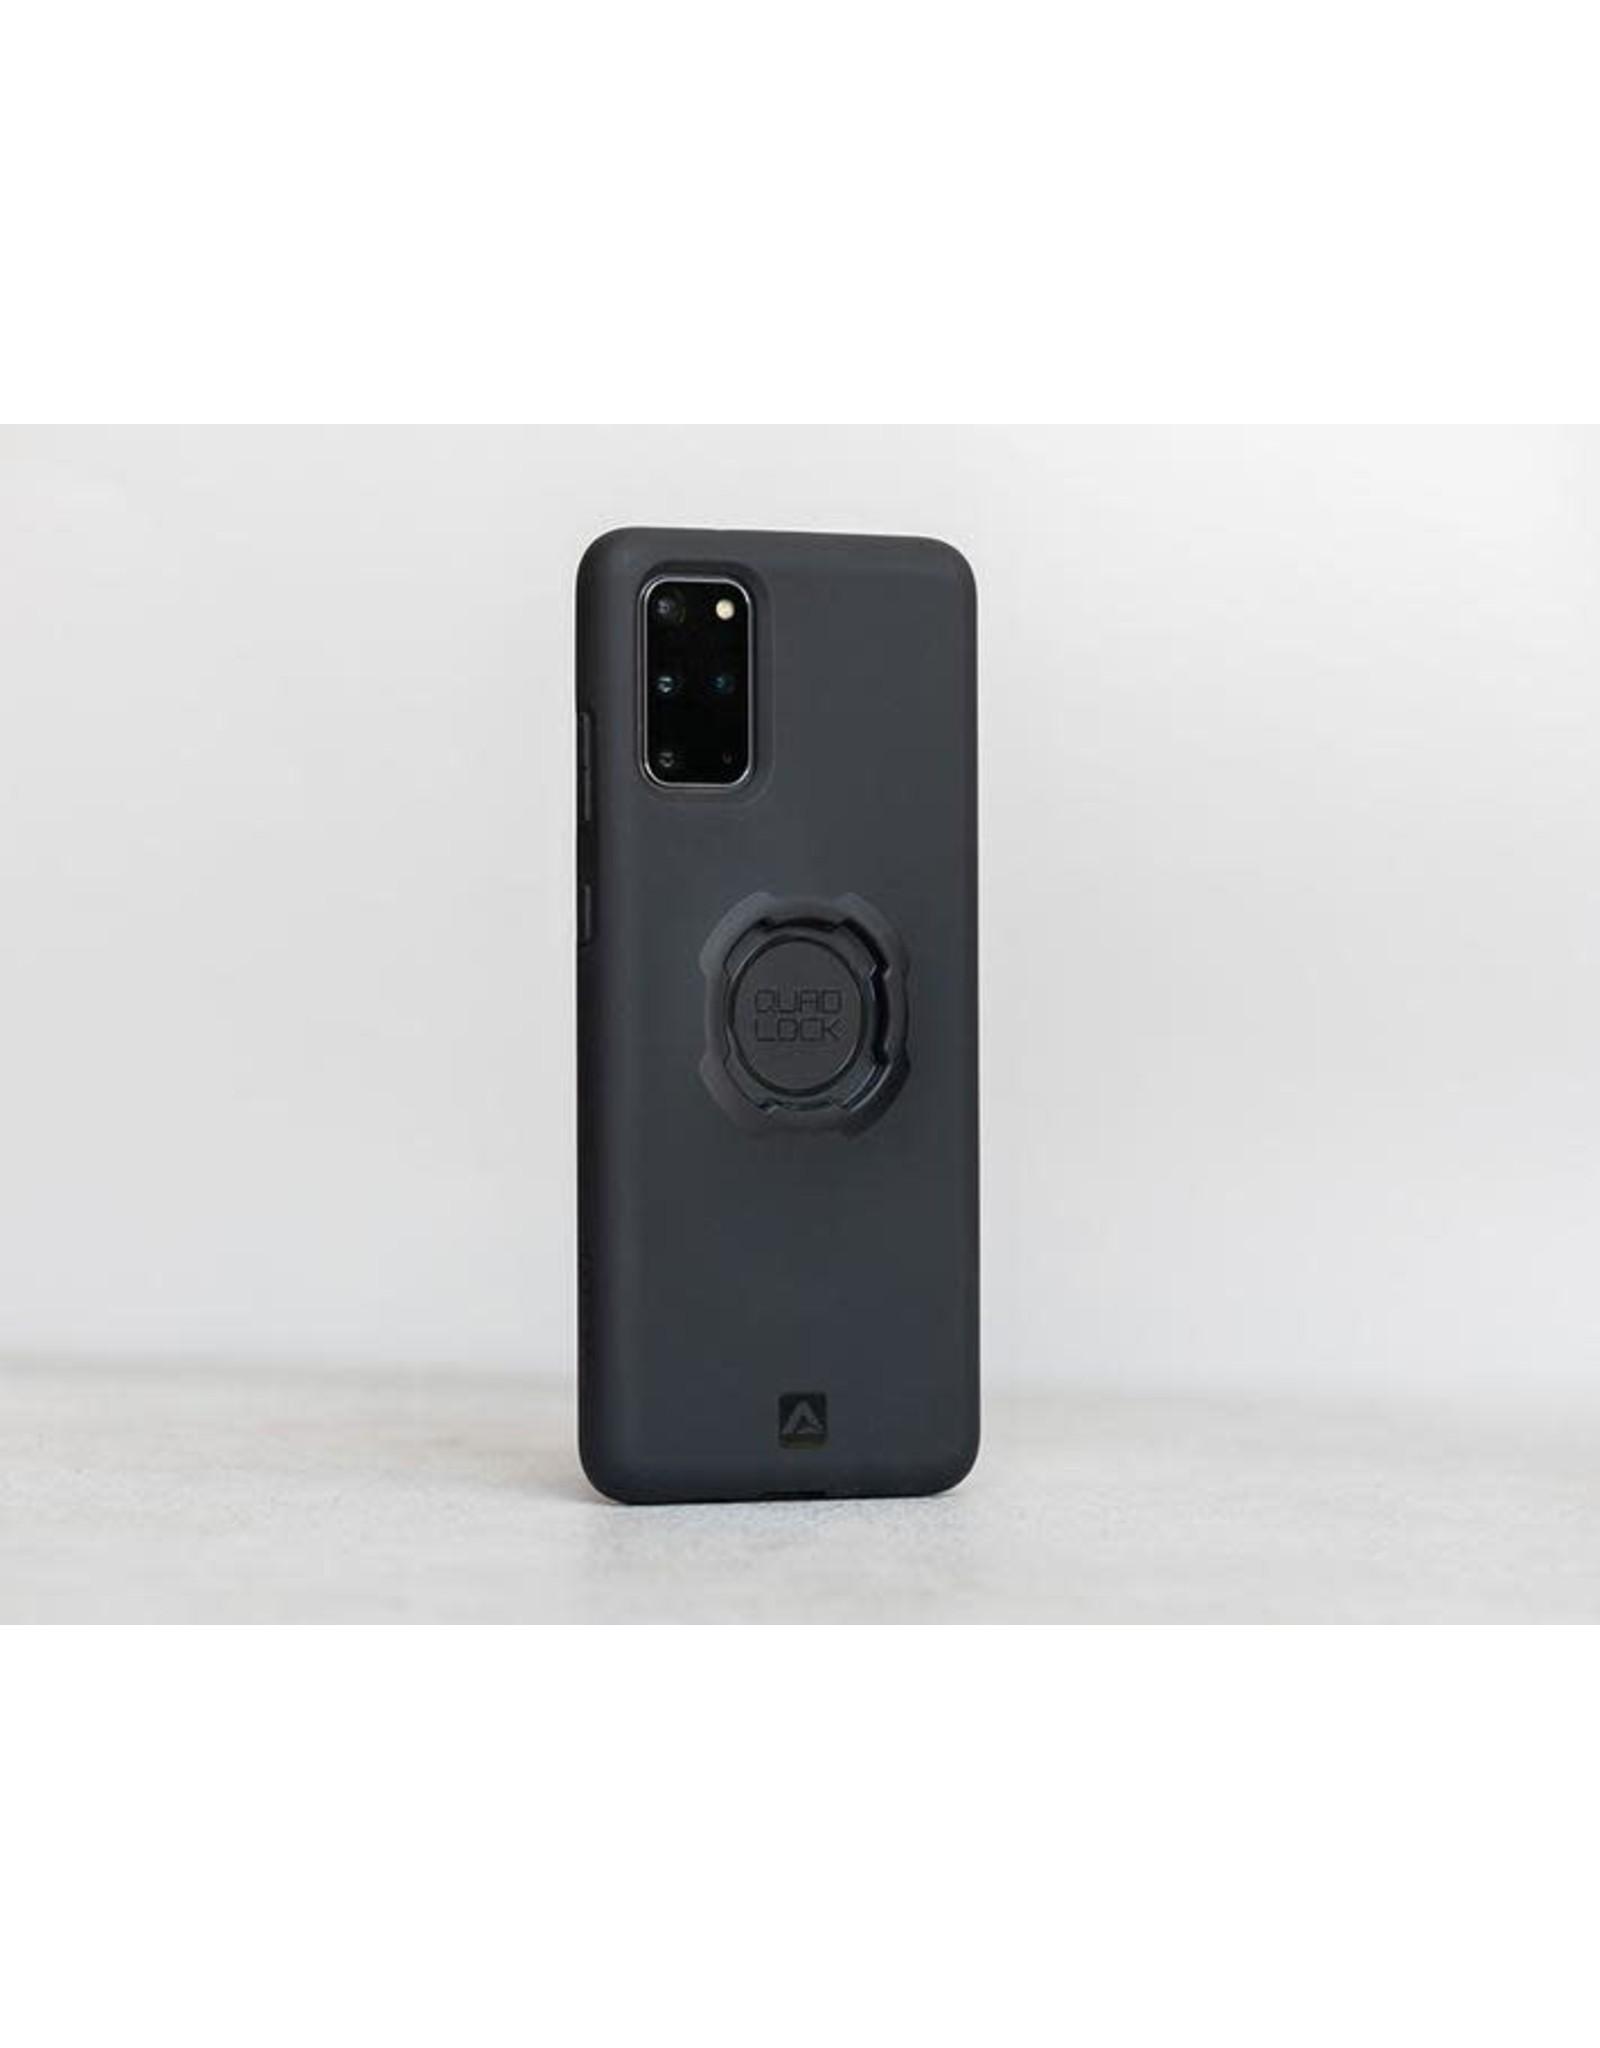 Quad Lock Galaxy S21 Ultra Phone Mount Case